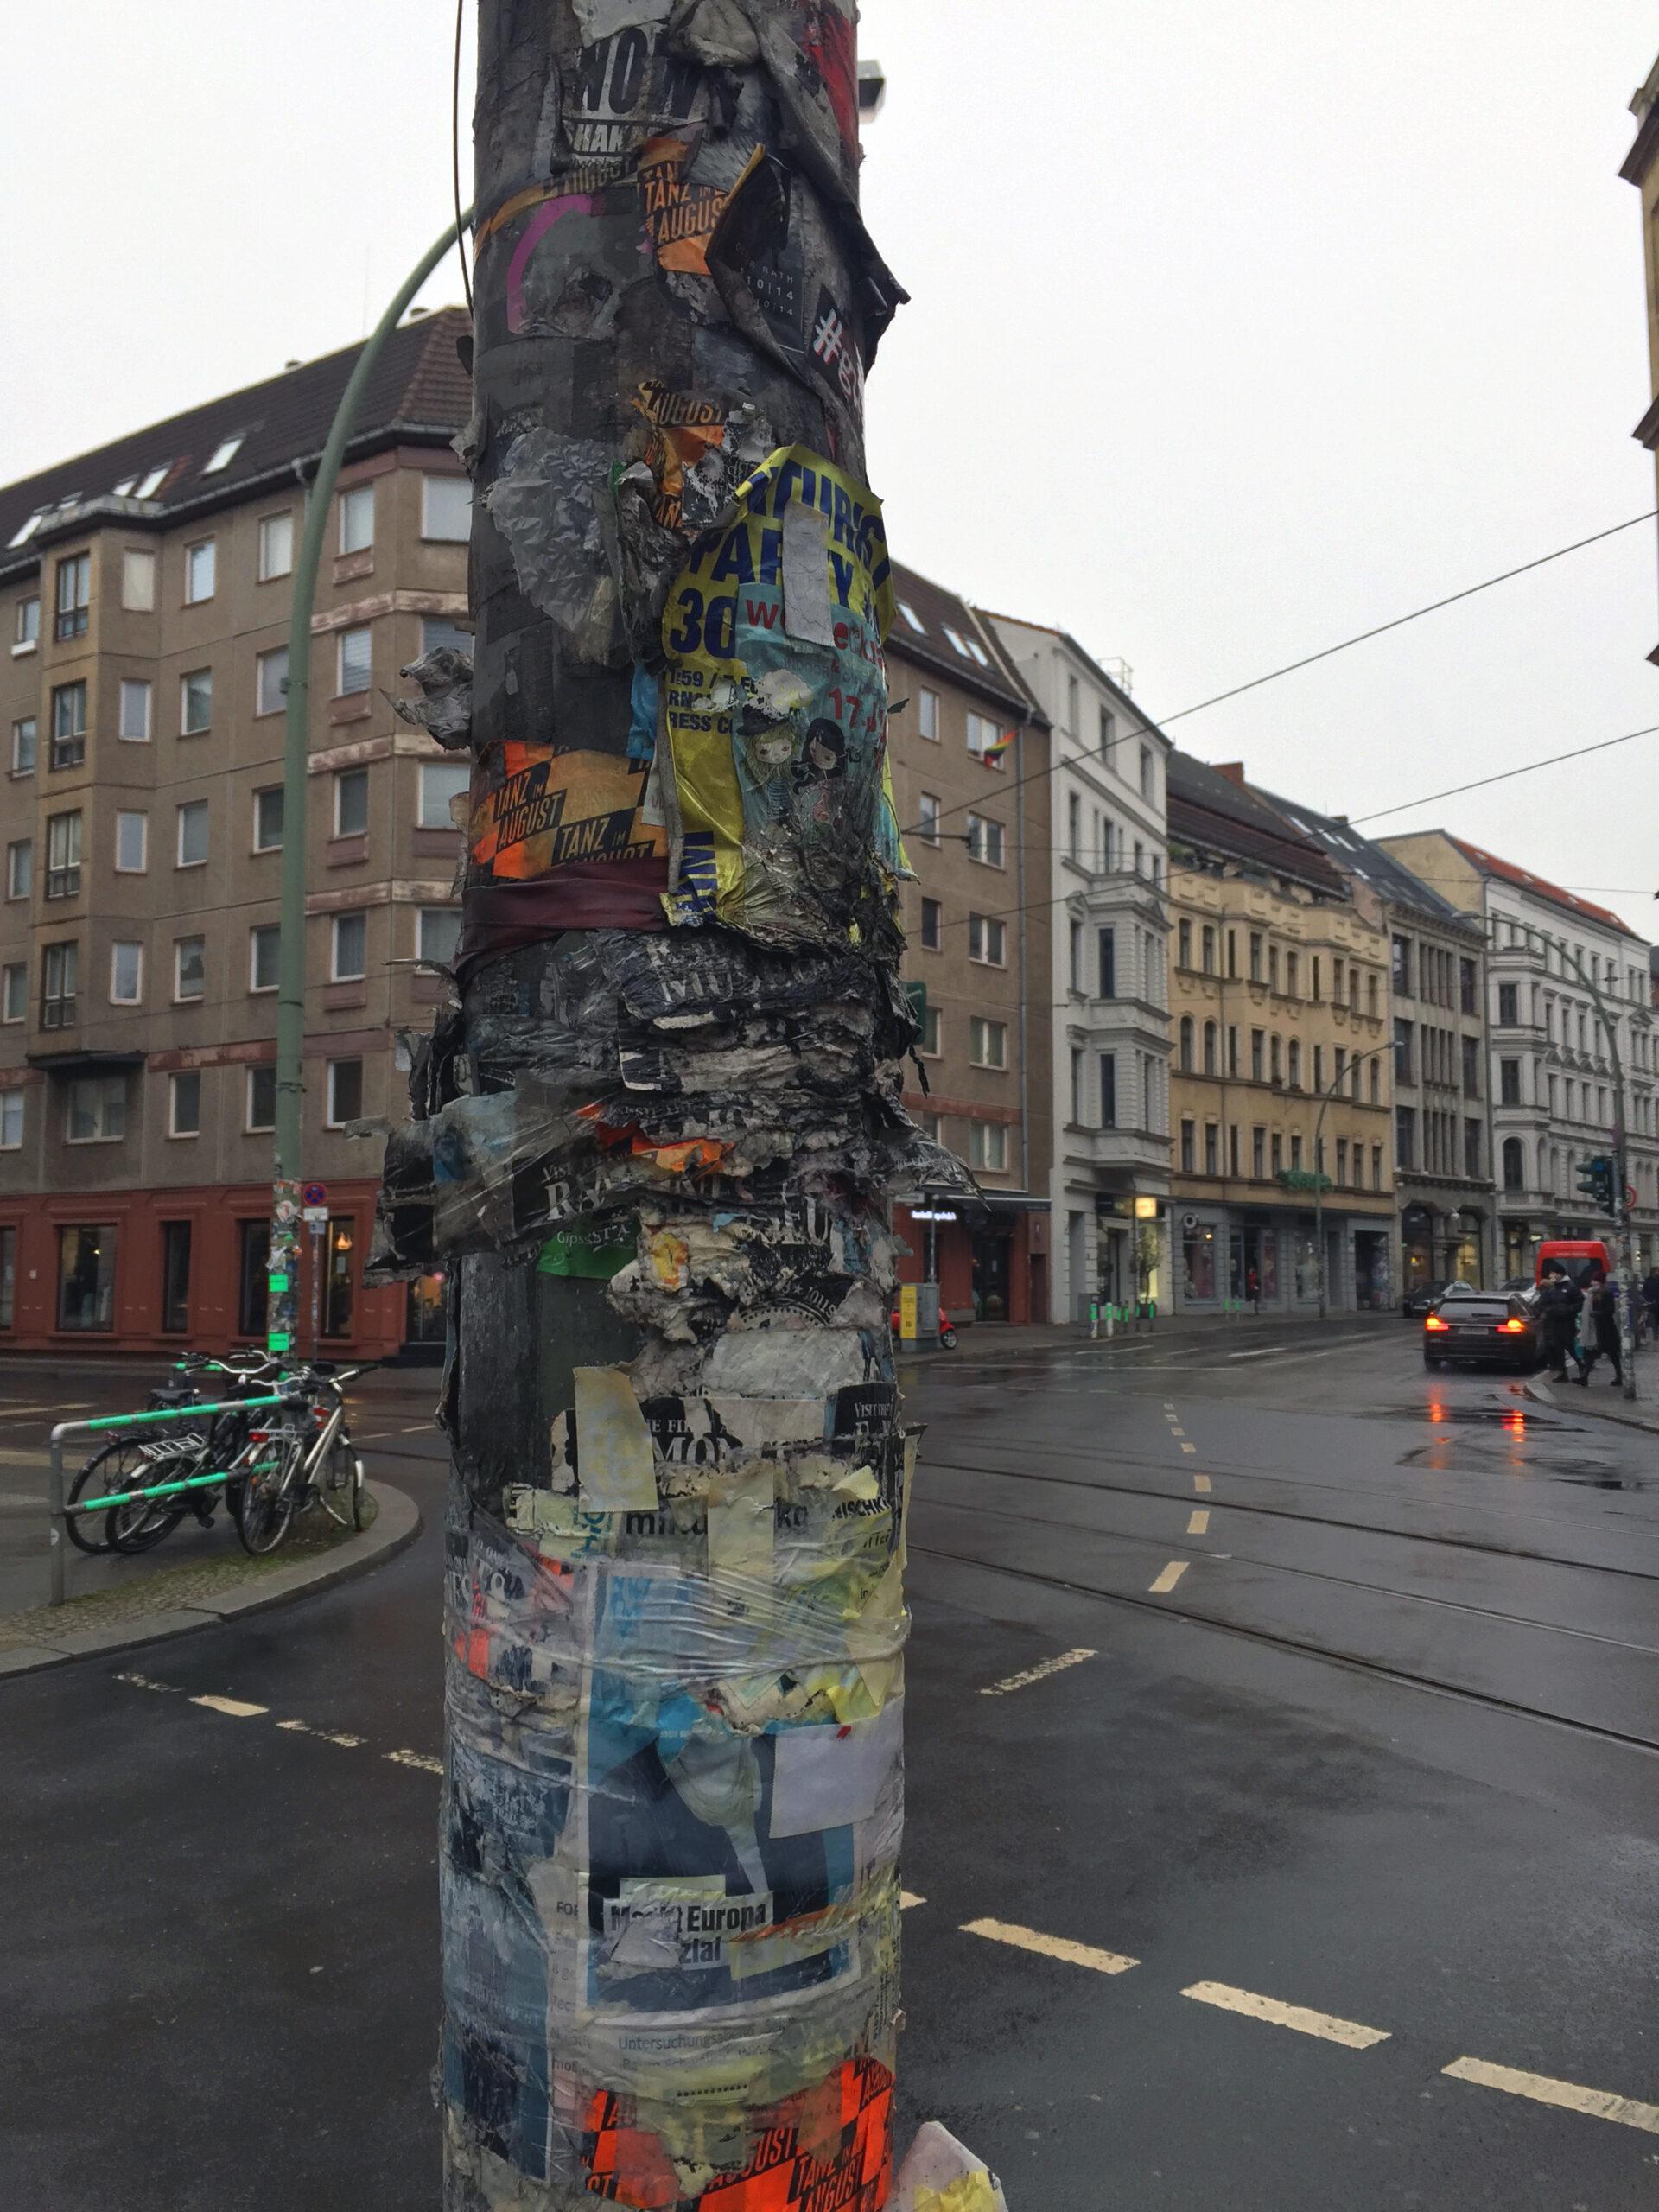 Spaziergang Berlin Mitte